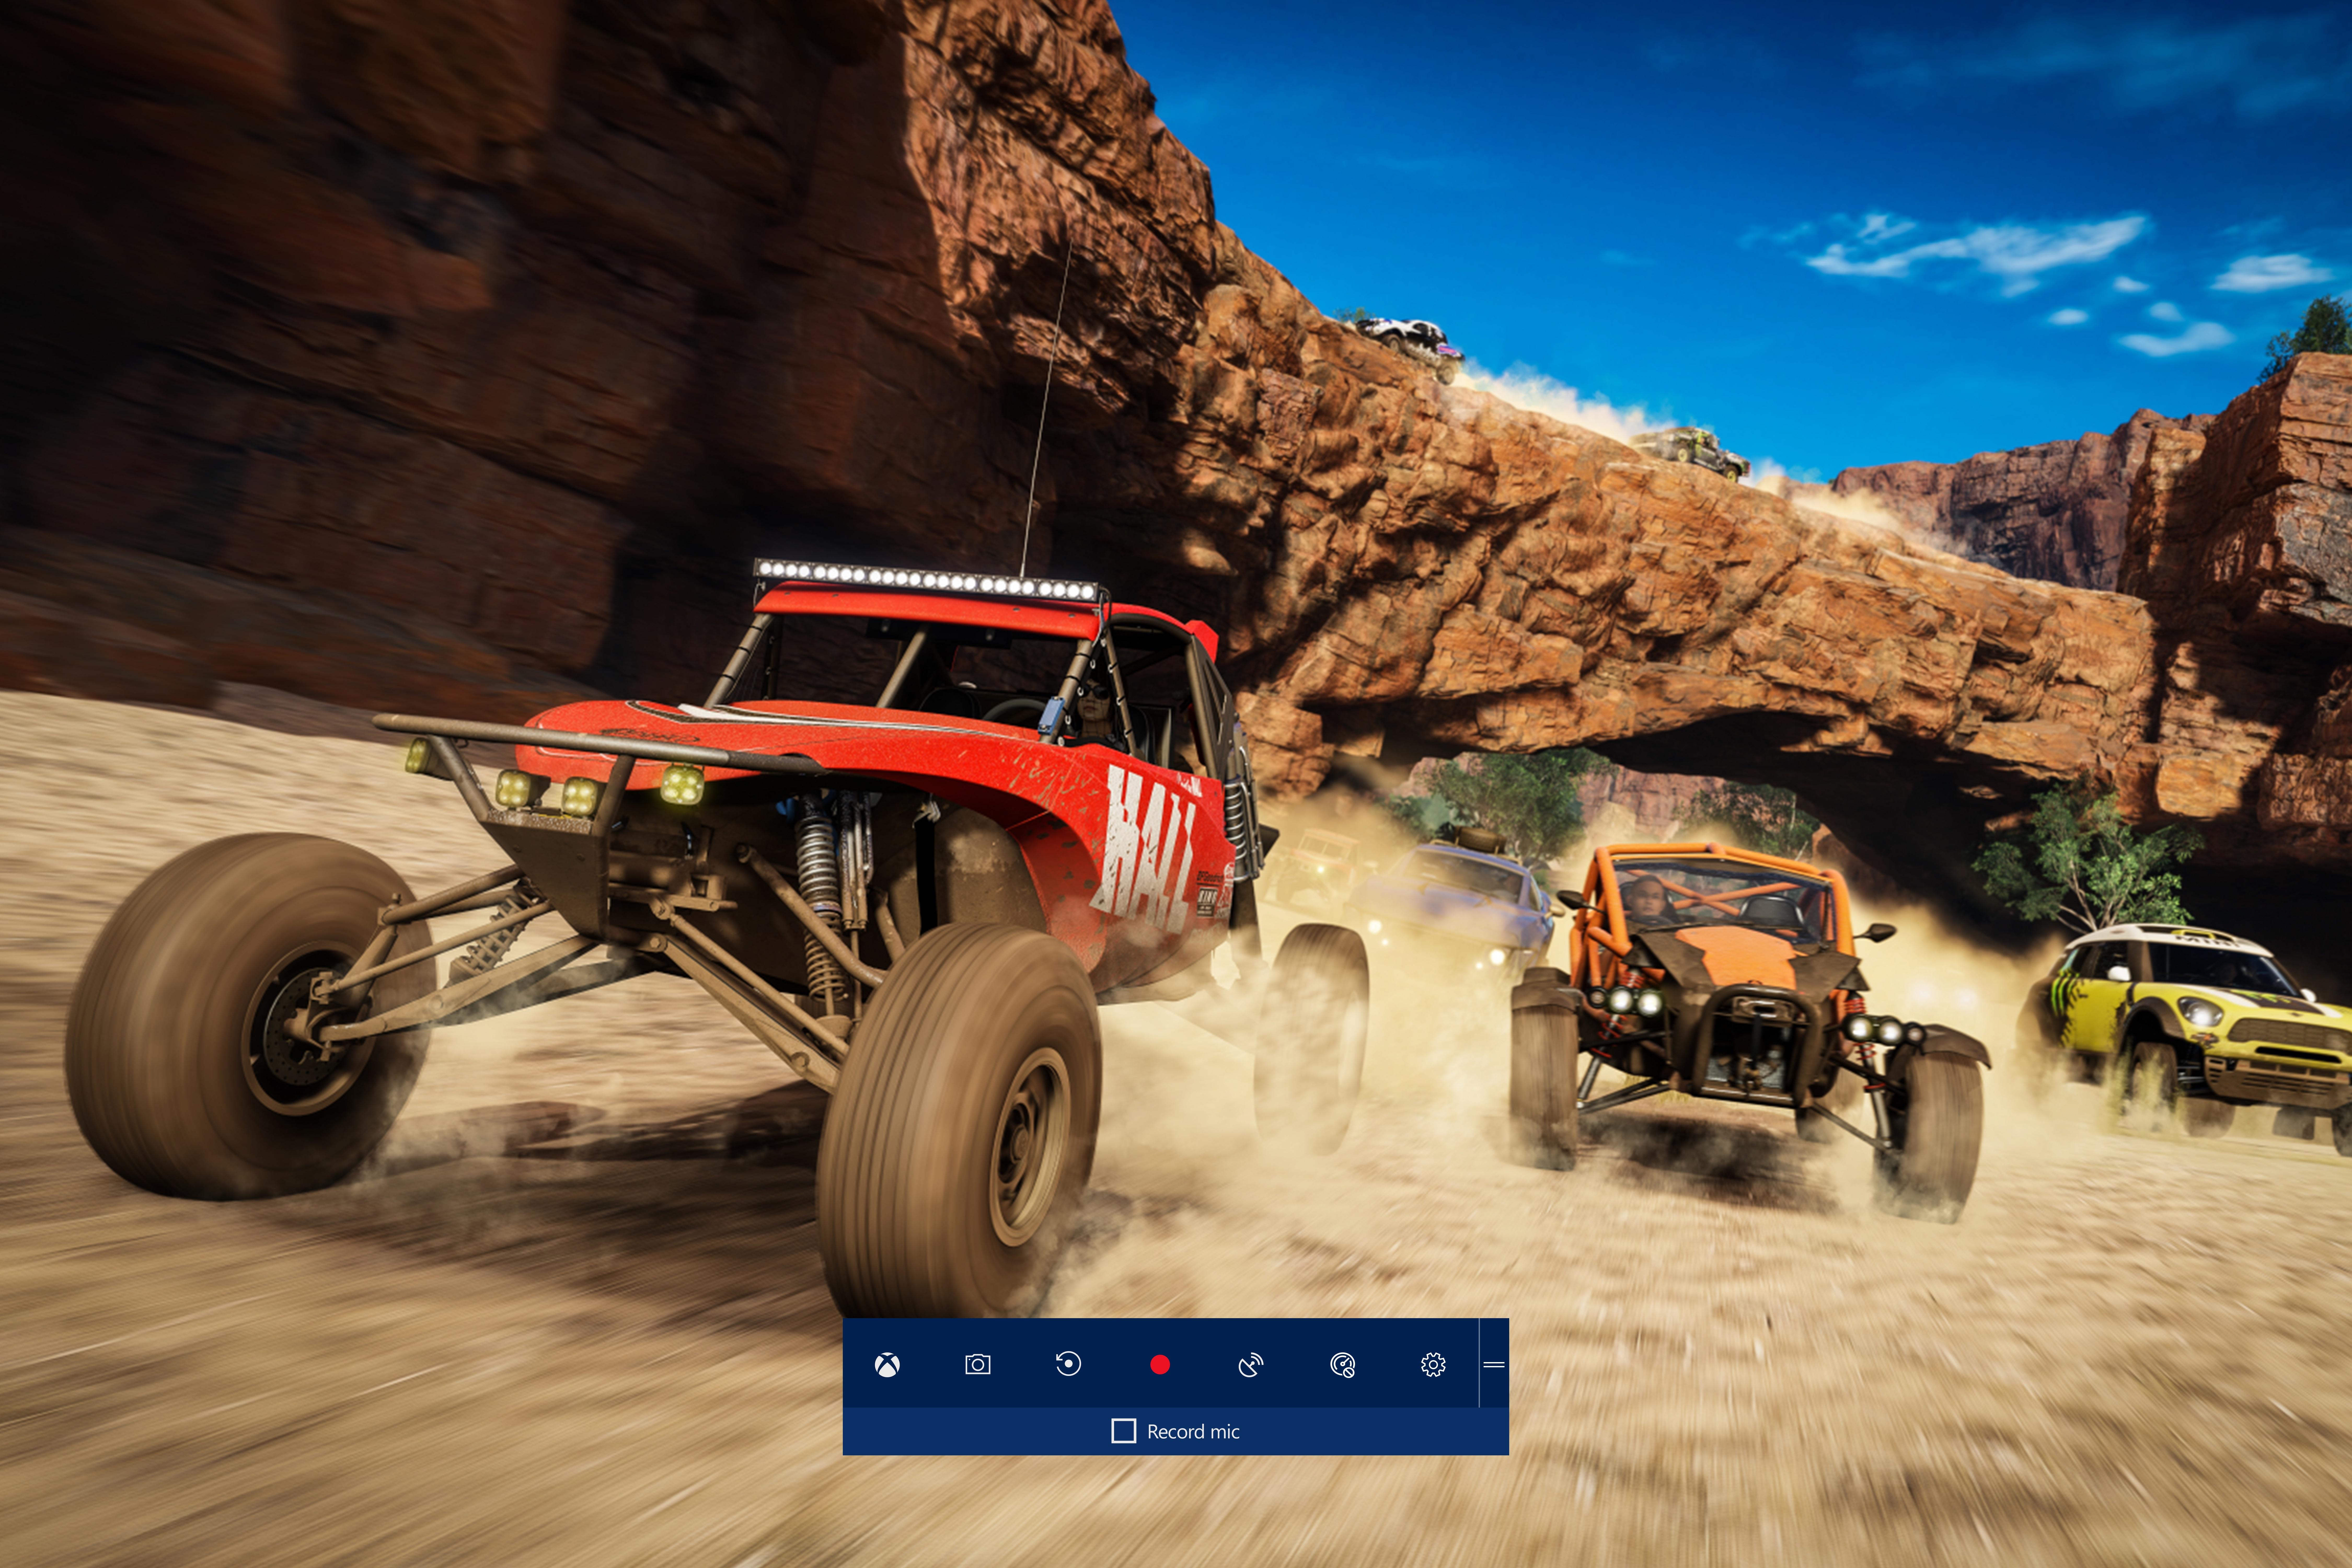 Barra de jogo mostrada no jogo de corrida Forza